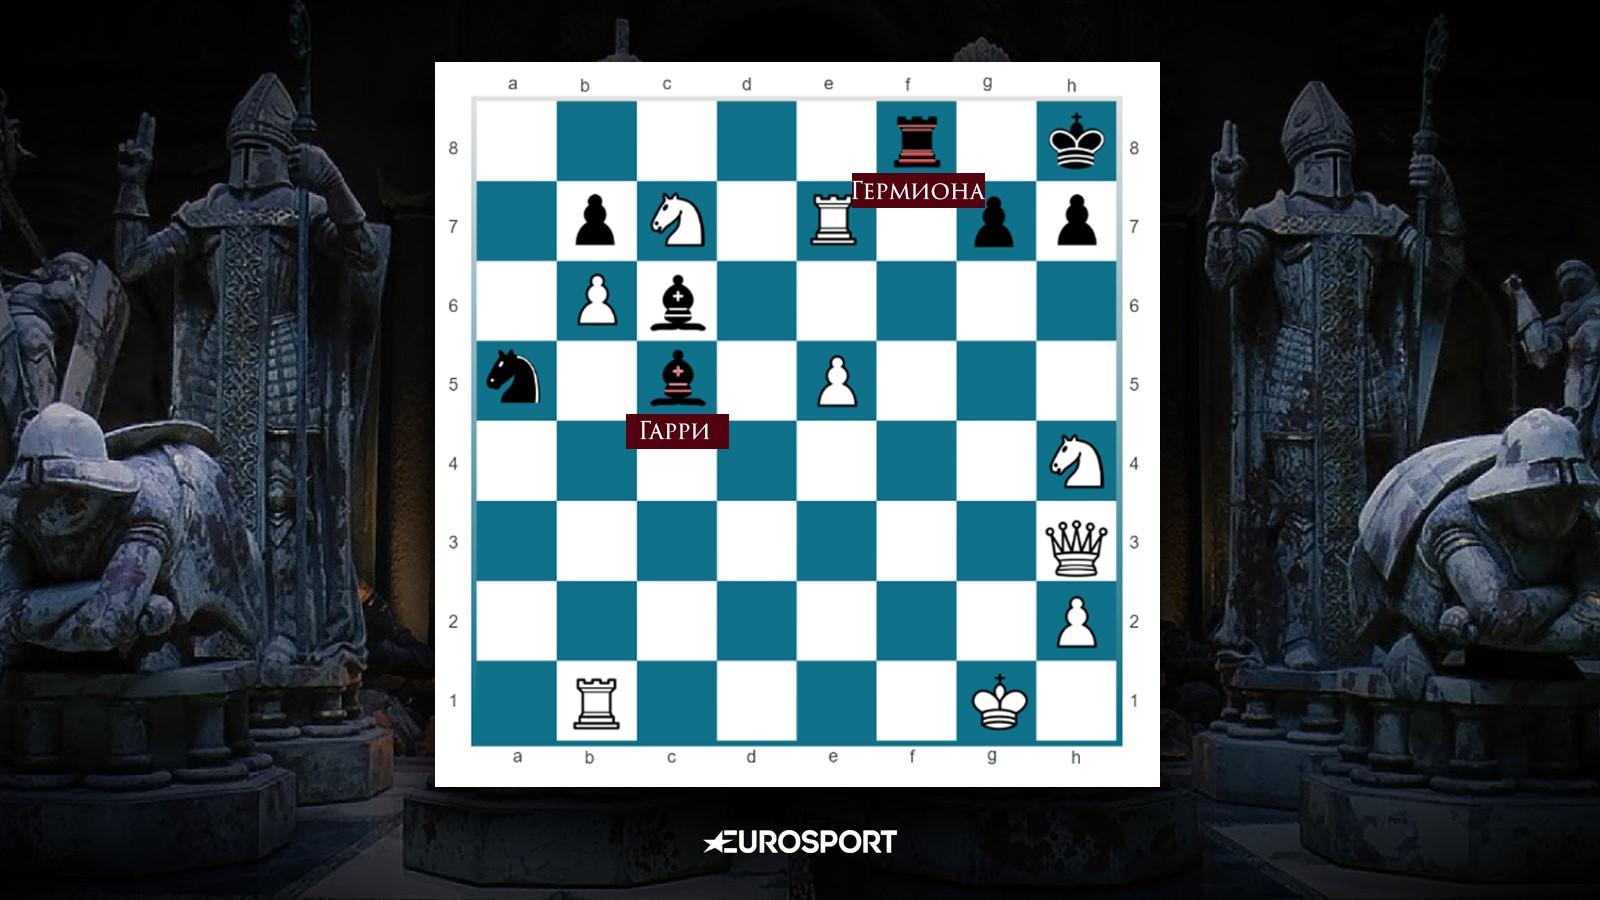 https://i.eurosport.com/2021/01/08/2967129.jpg